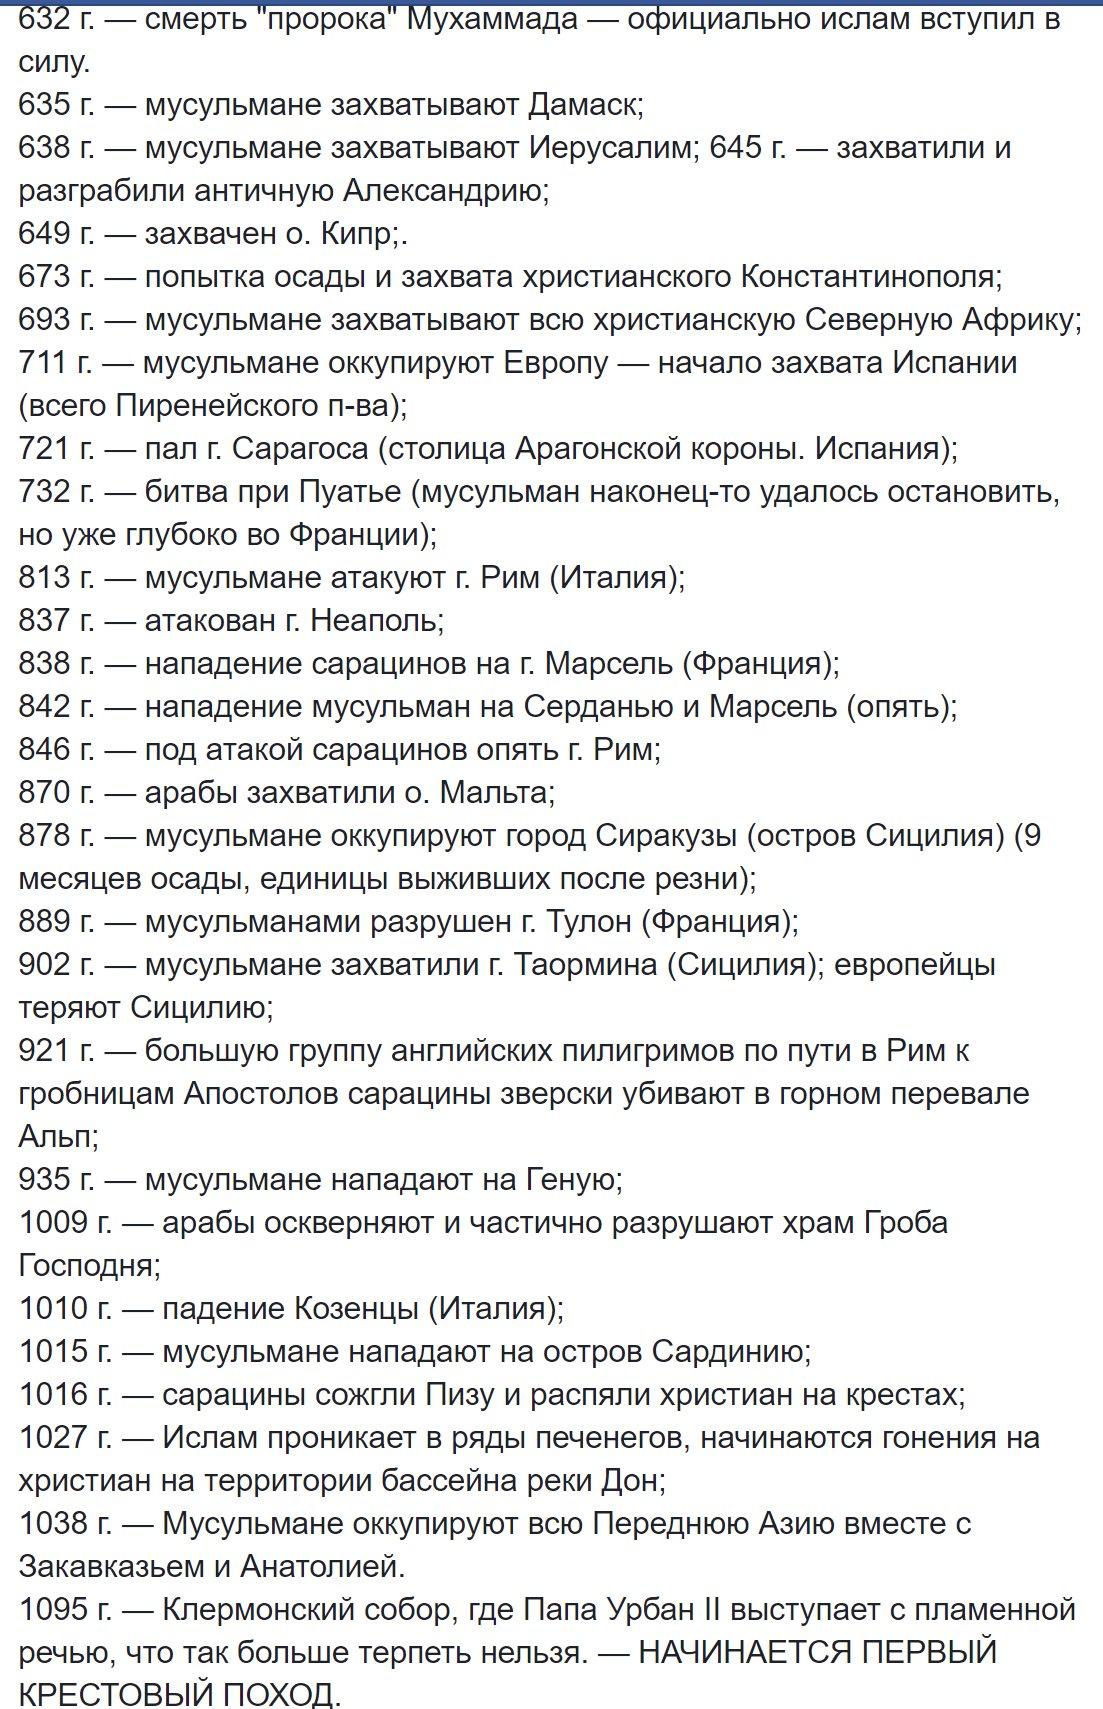 https://img-fotki.yandex.ru/get/362196/19902916.26/0_fcd62_241e8100_orig